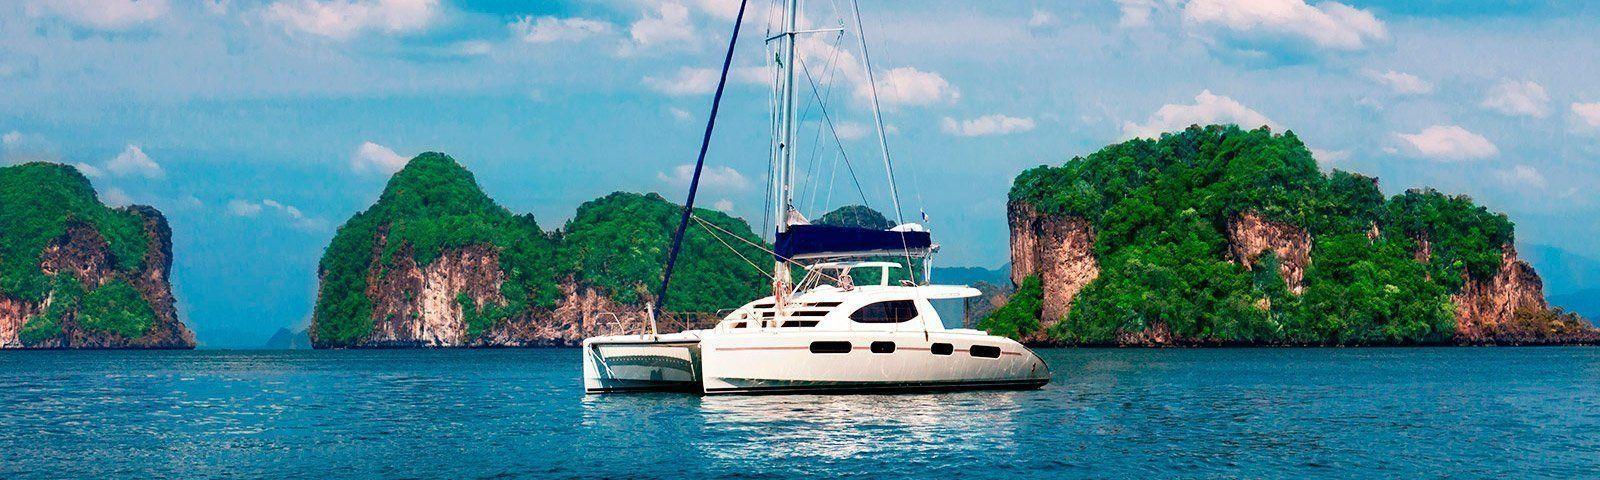 travesia-tailandia-barco-catamaran (3)